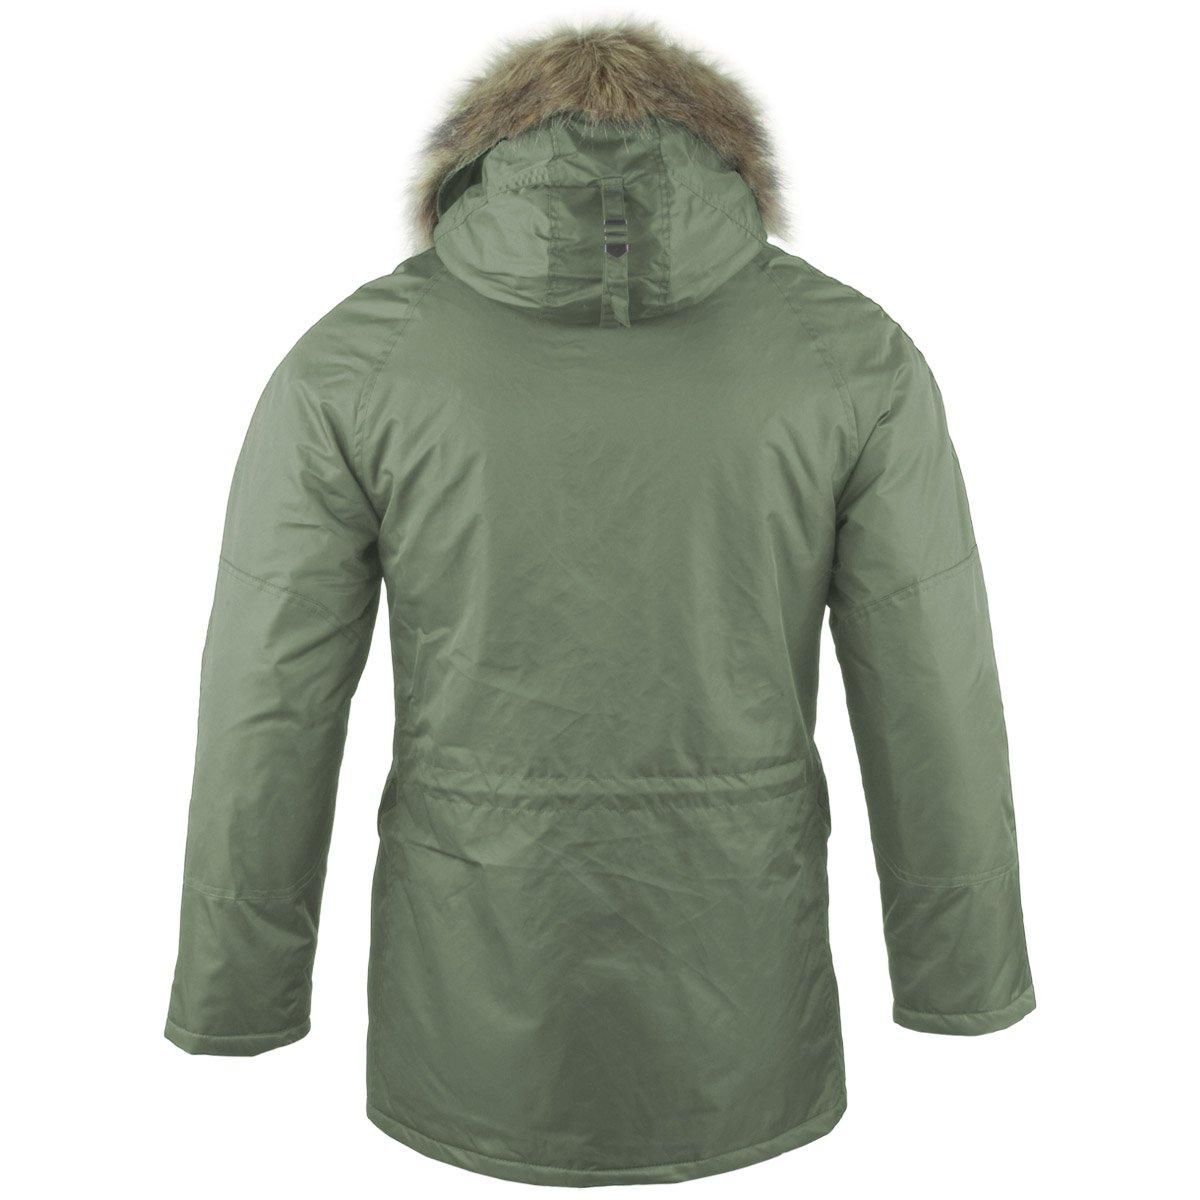 b9c51be4ec9 Mil-Tec N3B Flight Jacket Olive at Amazon Men s Clothing store